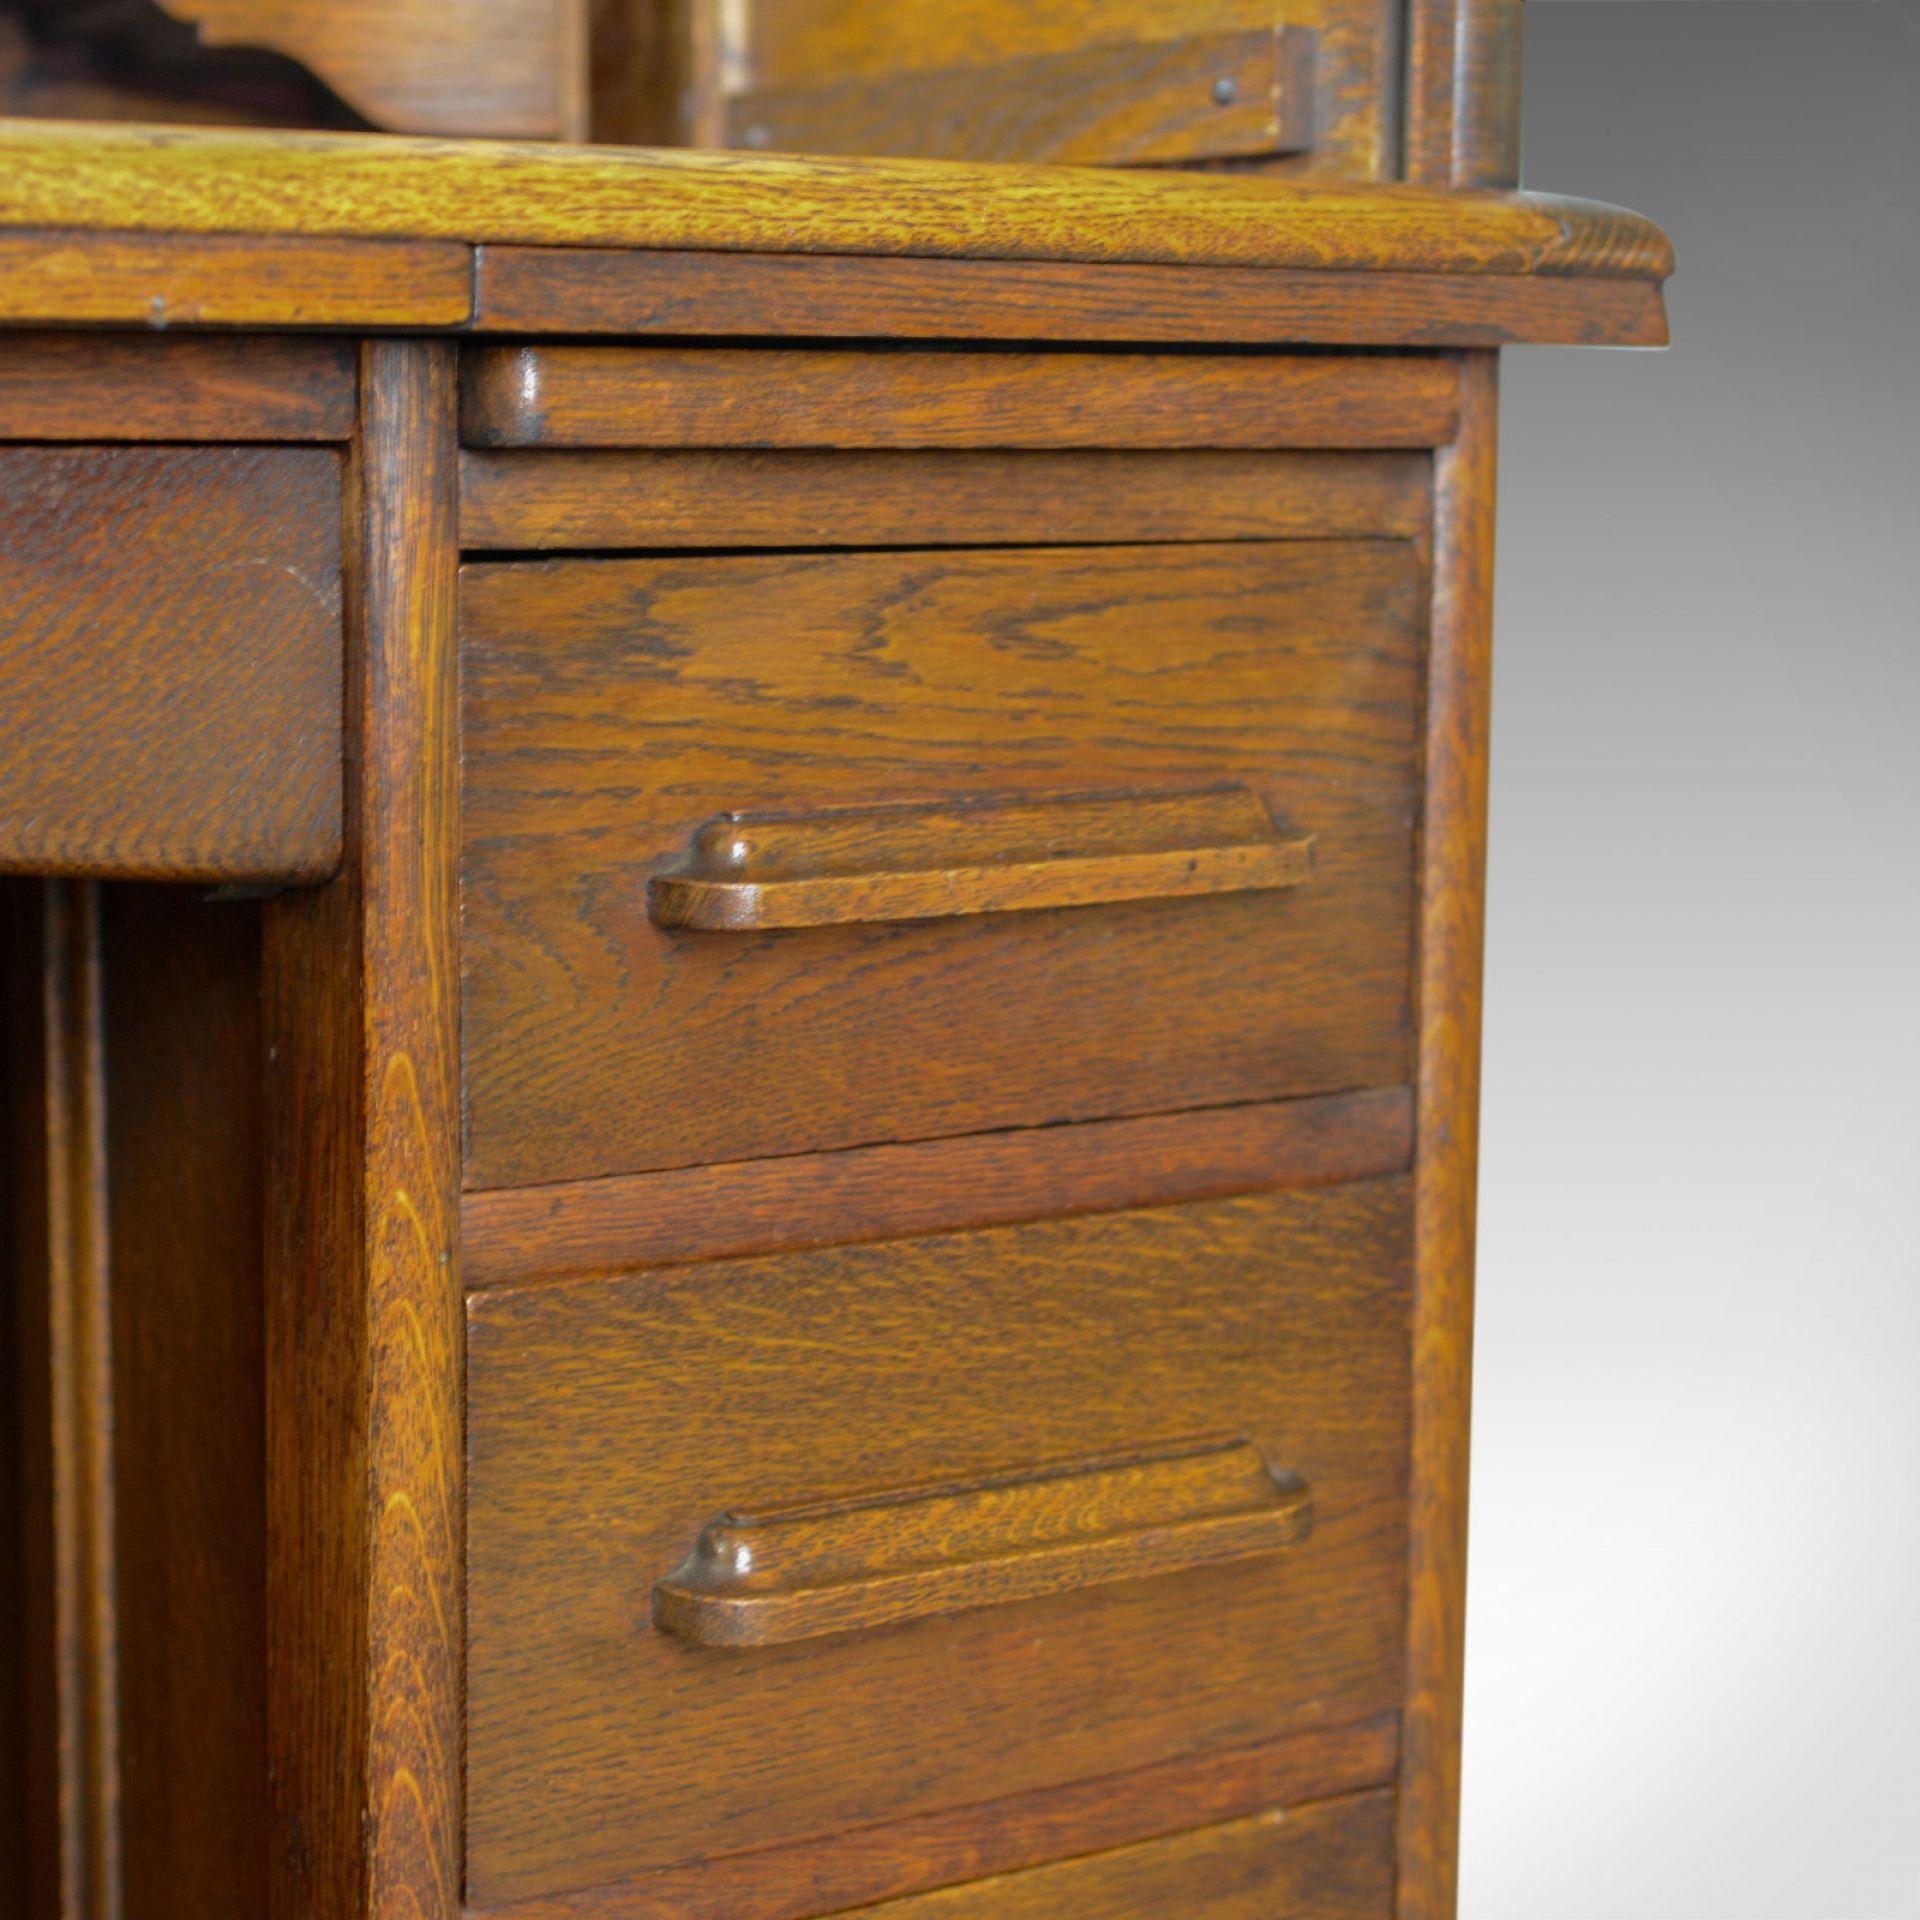 Small Antique Roll Top Desk, Oak, Tambour, William Angus and Co Ltd London c1910